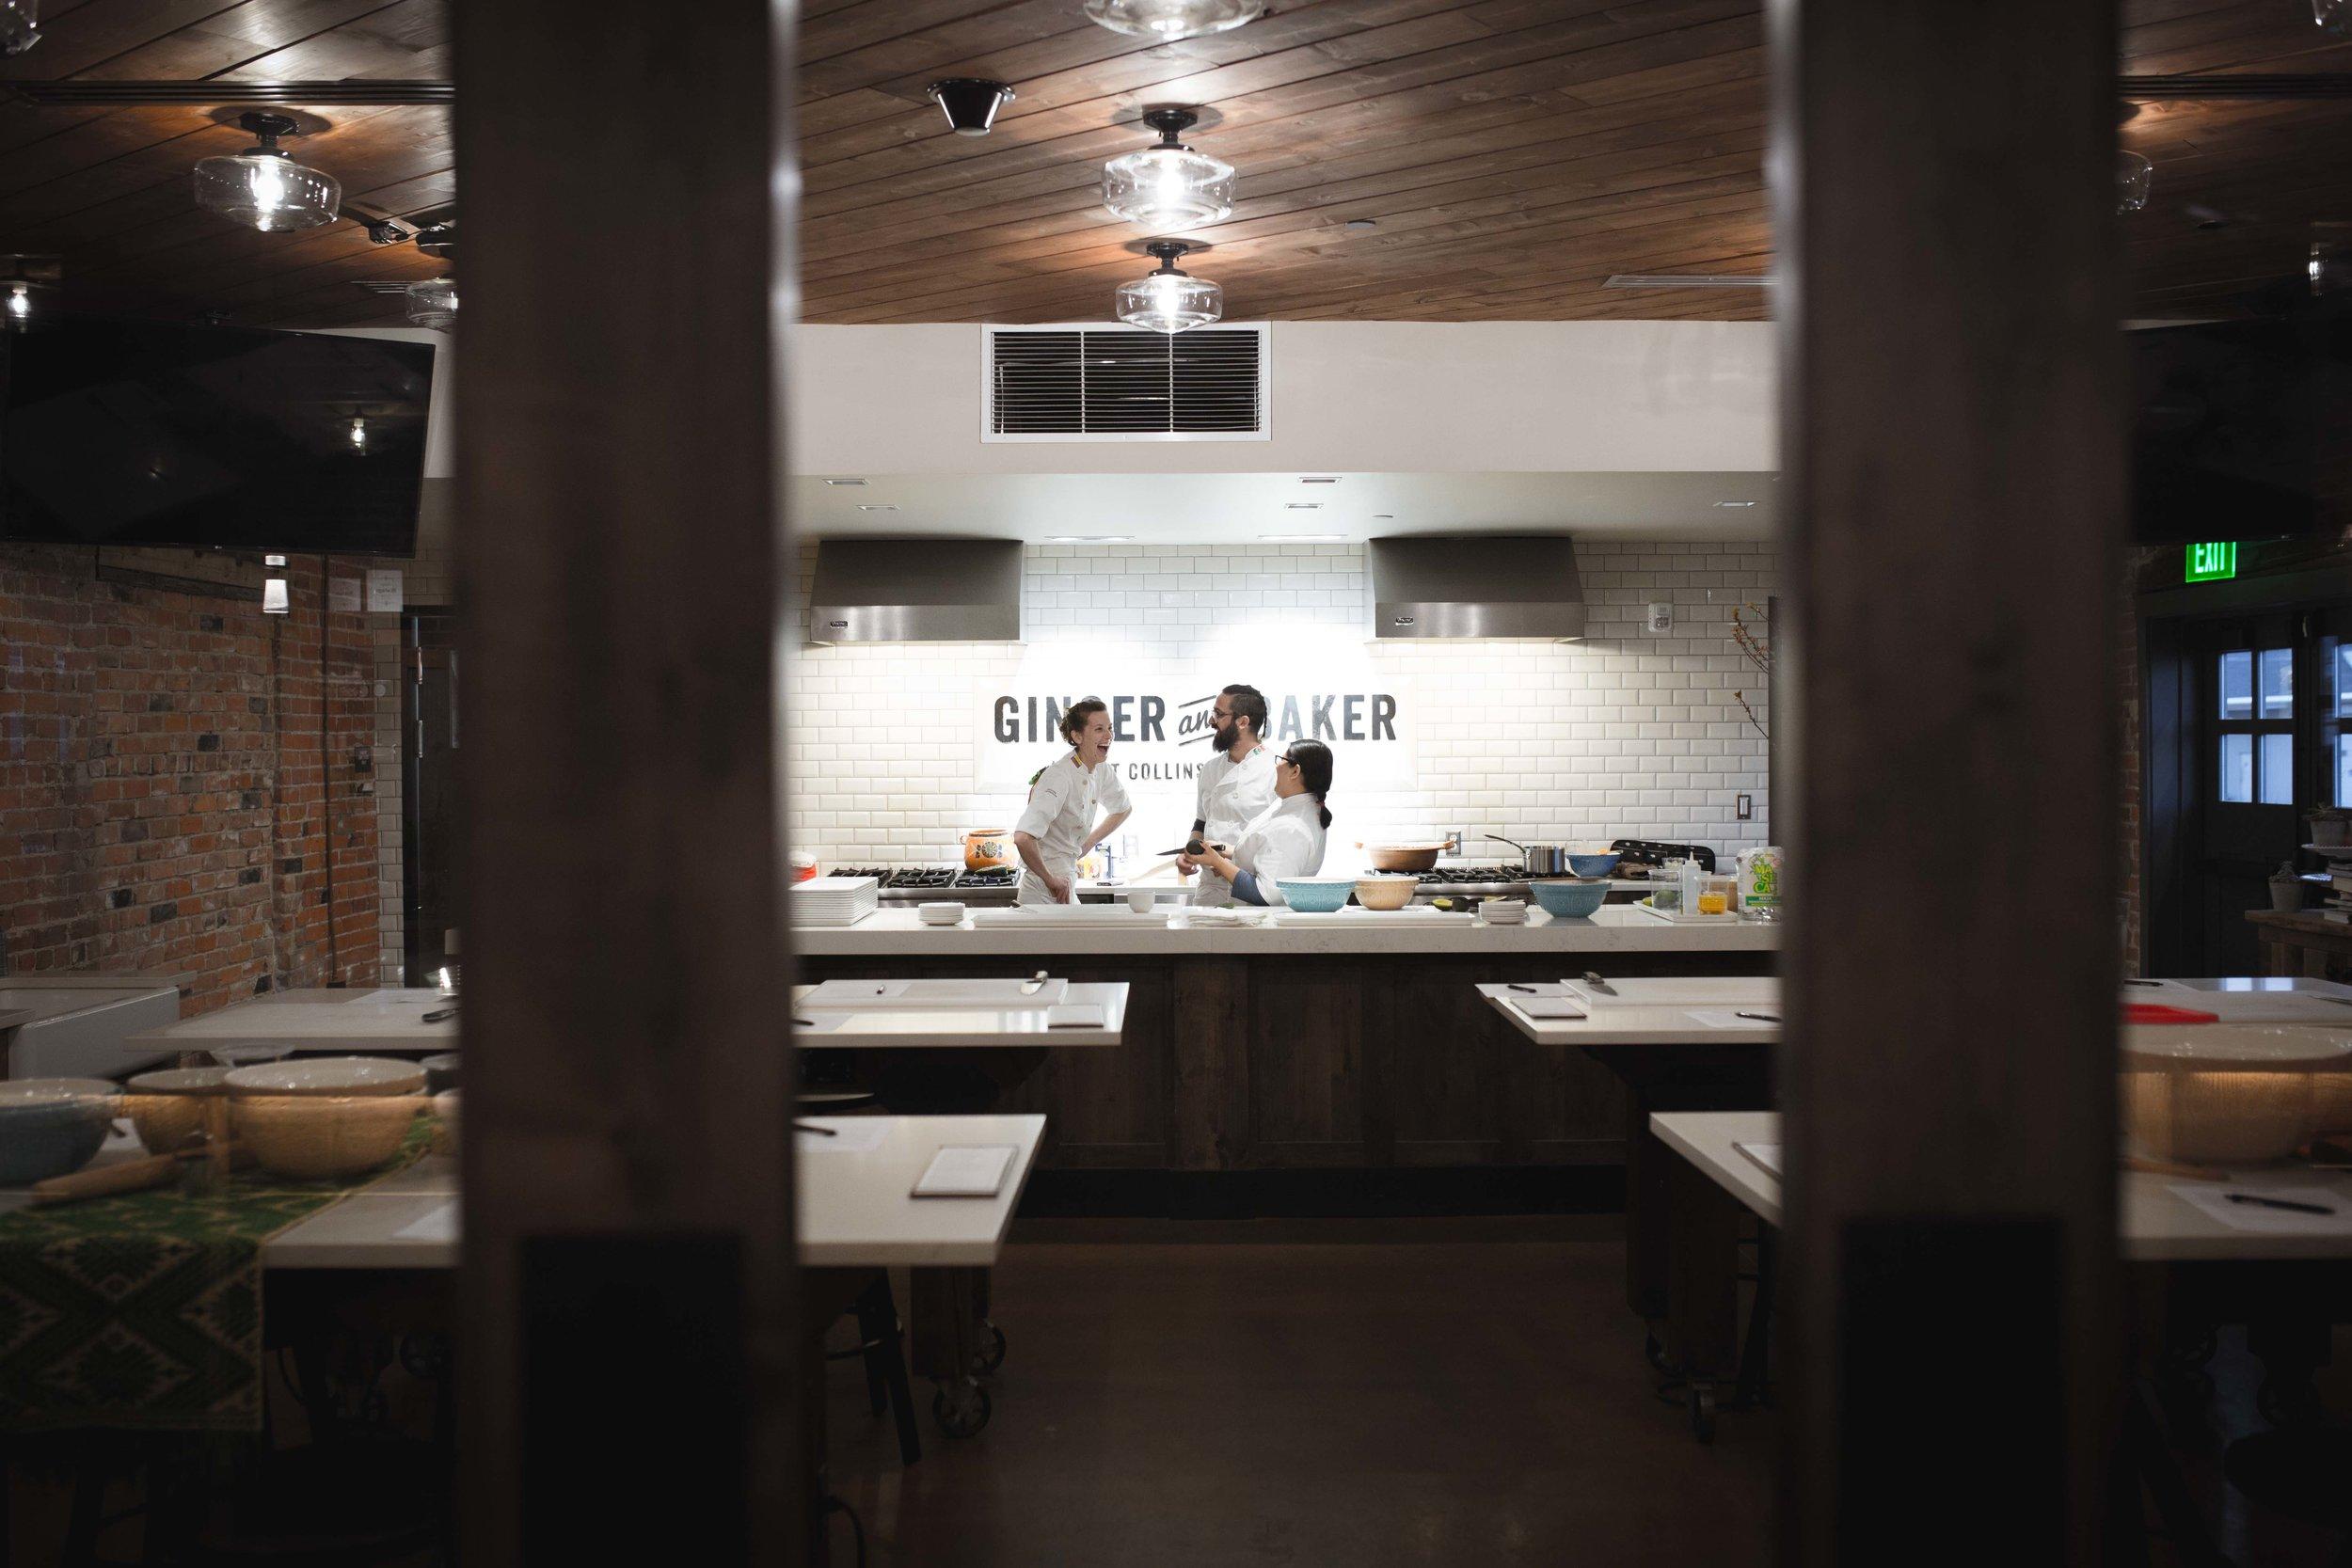 GingerandBaker-JuliyJuan-CookingClass-Feb28-7.jpg